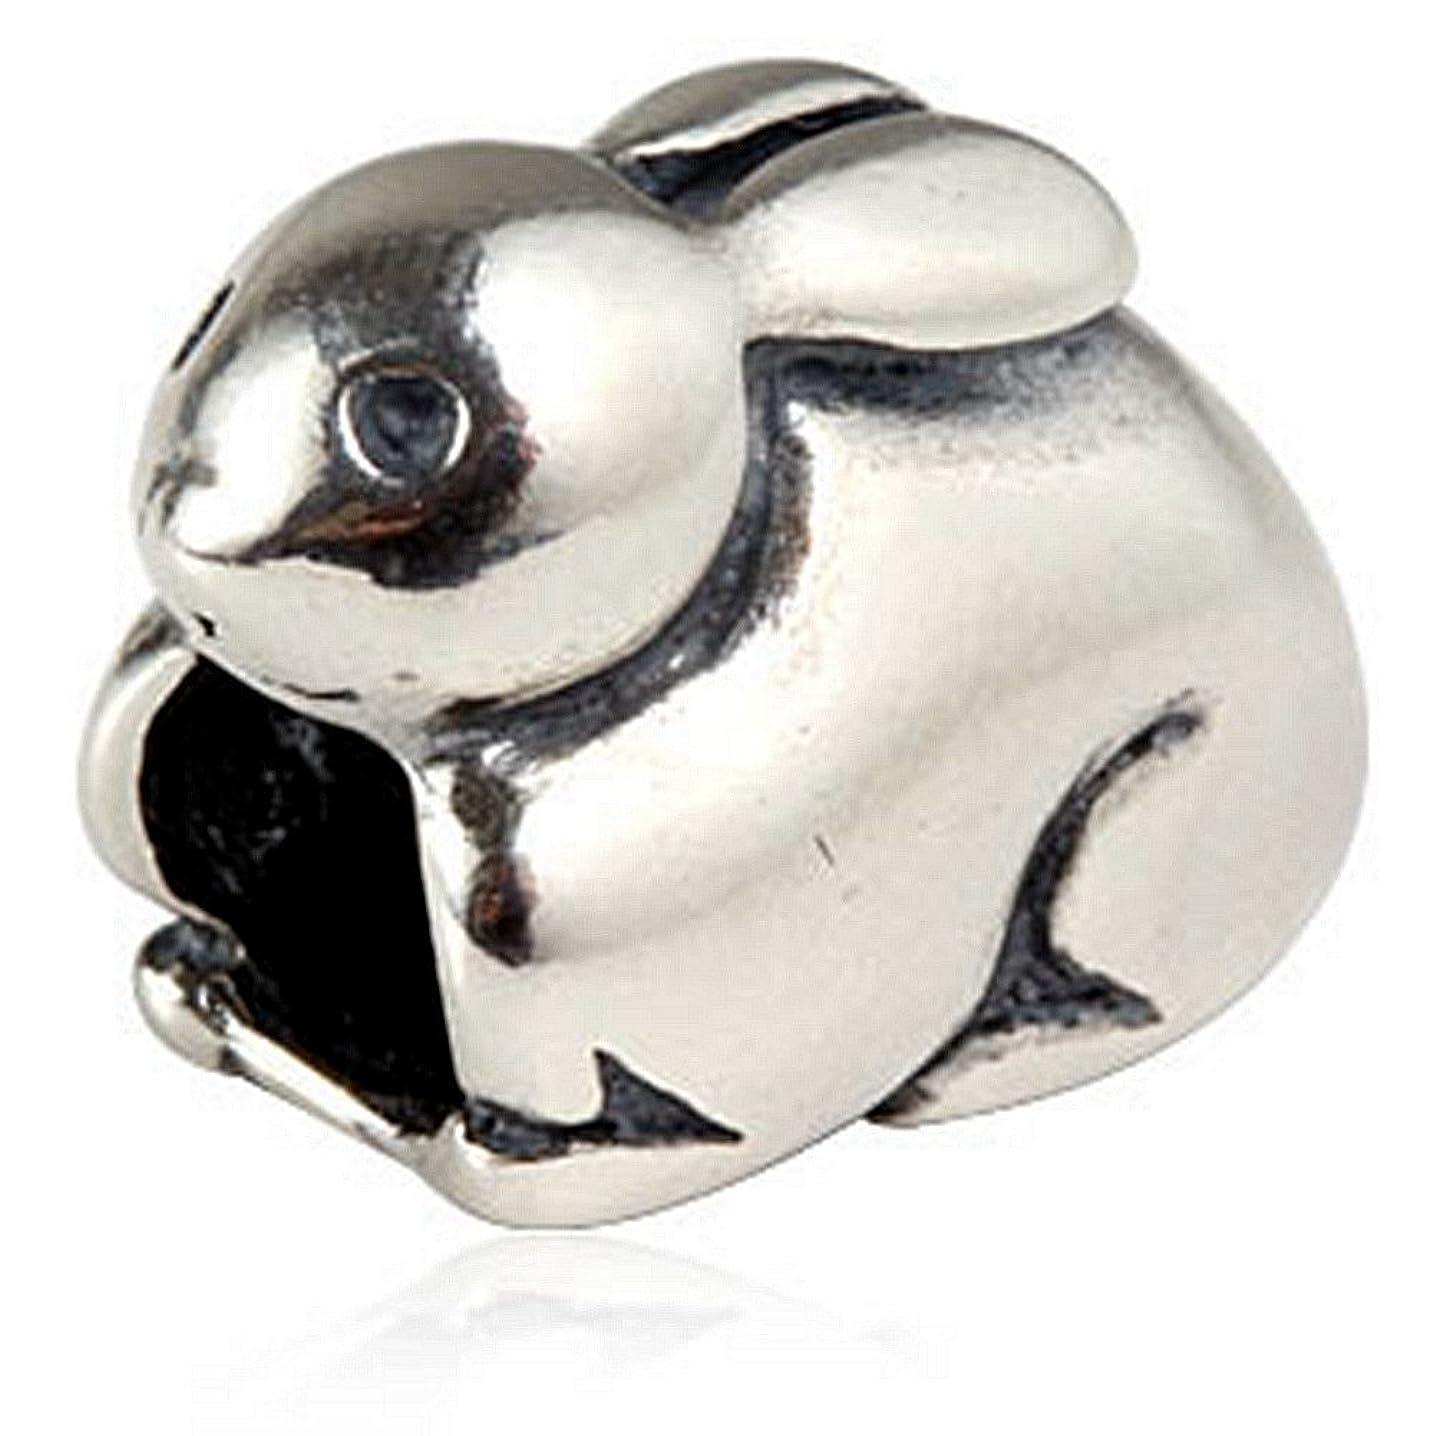 Lovely Rabbit Bunny Charm 925 Sterling Silver Animal Bead fit DIY Charm Bracelet Jewelry